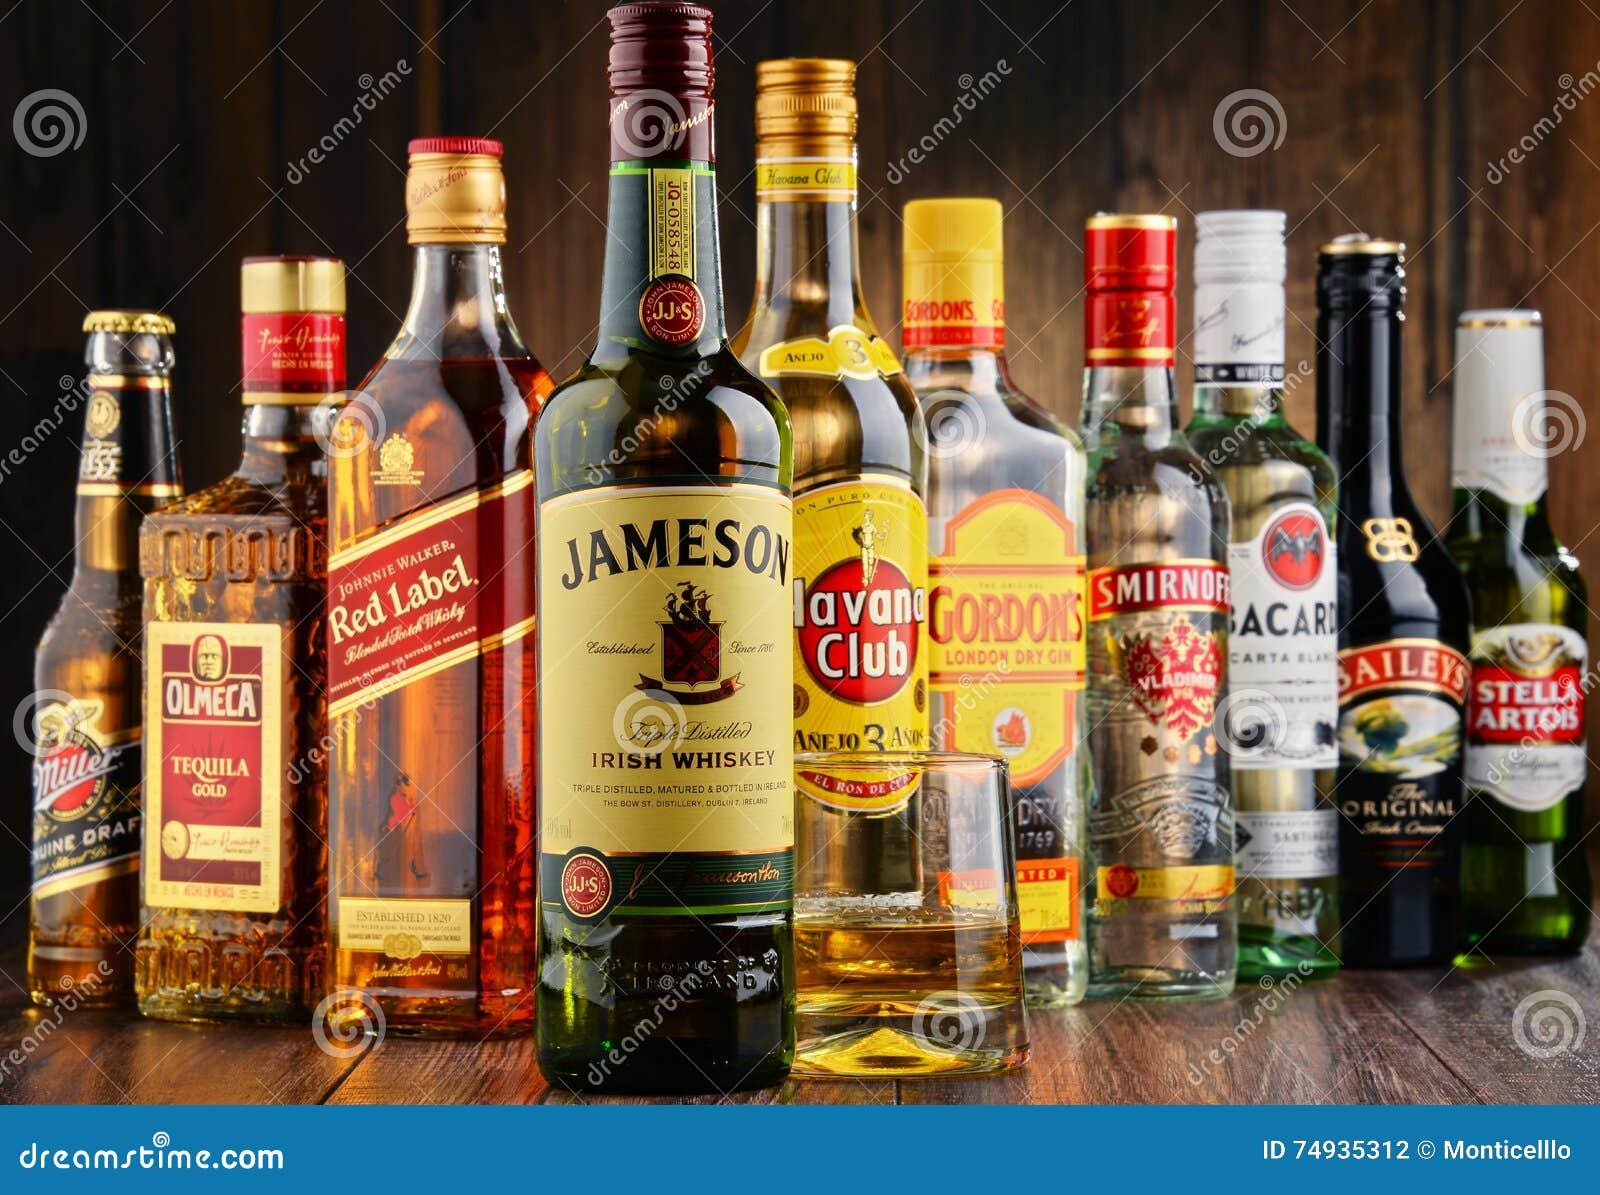 Bottles Of Assorted Hard Liquor Brands Editorial